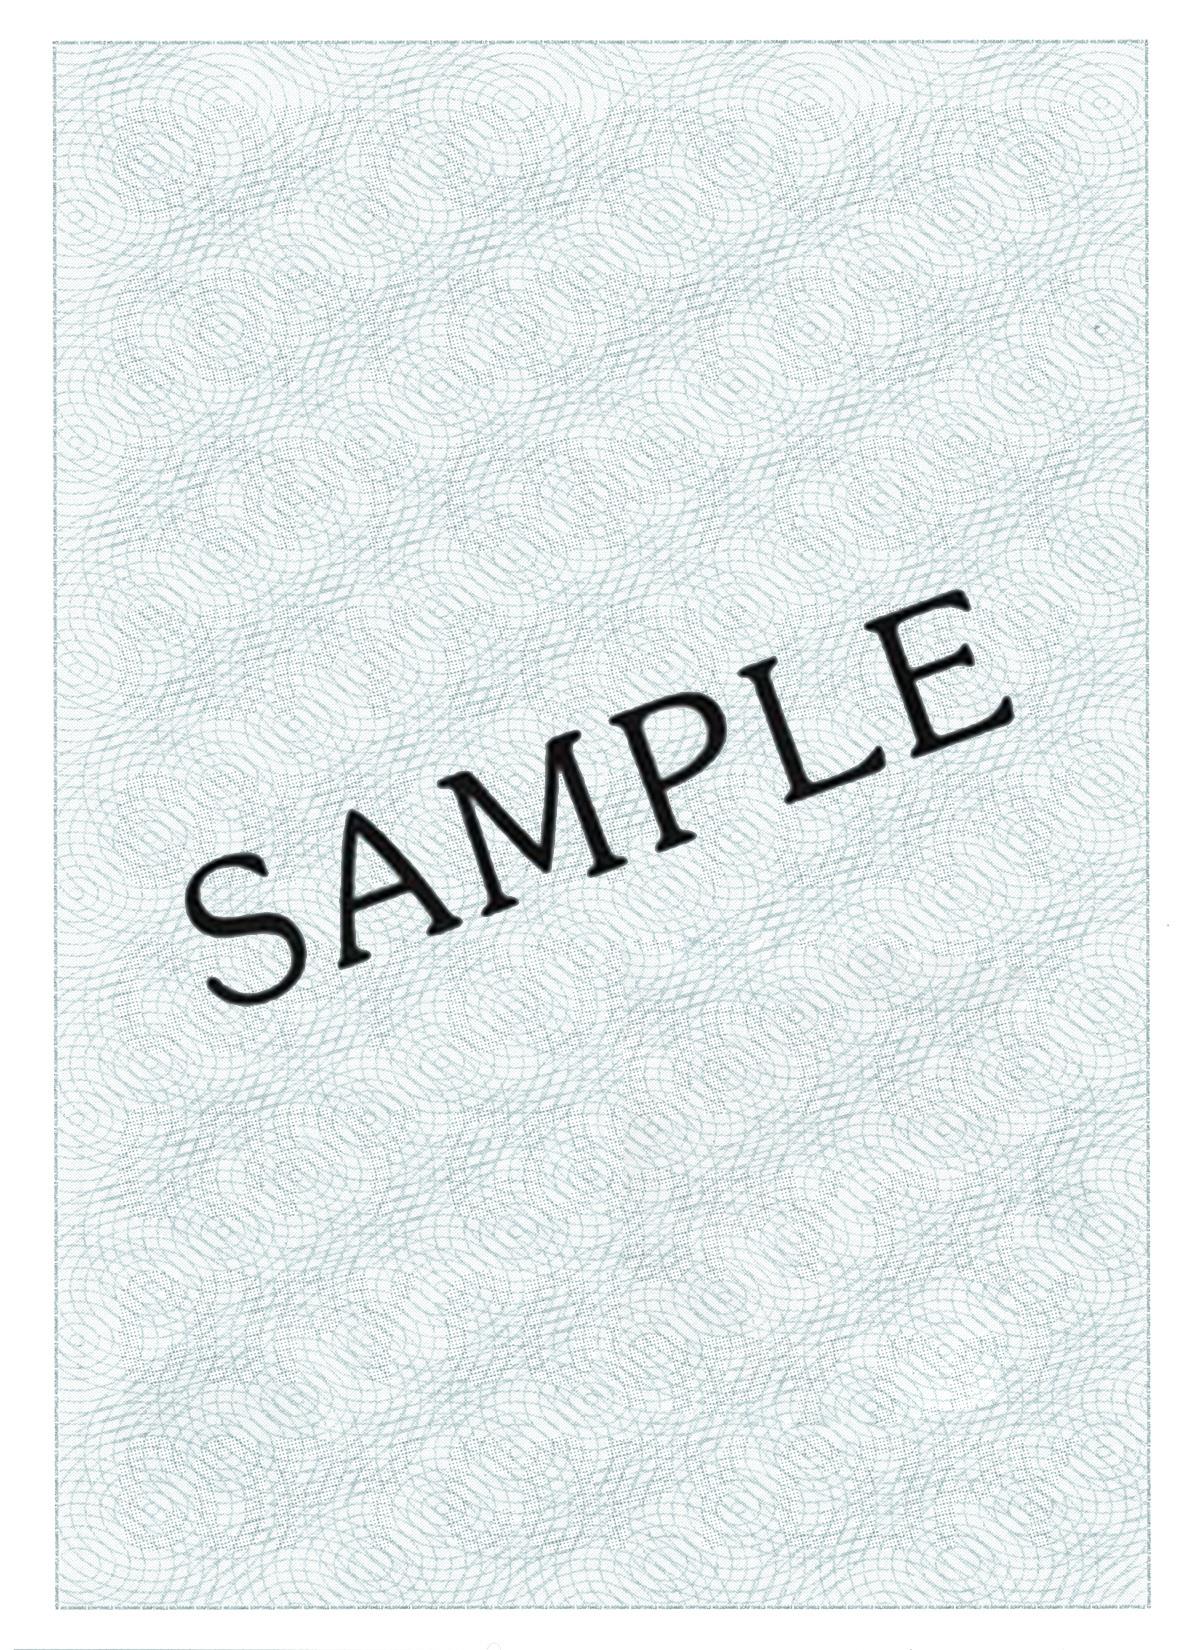 4. Idaho Rx Paper